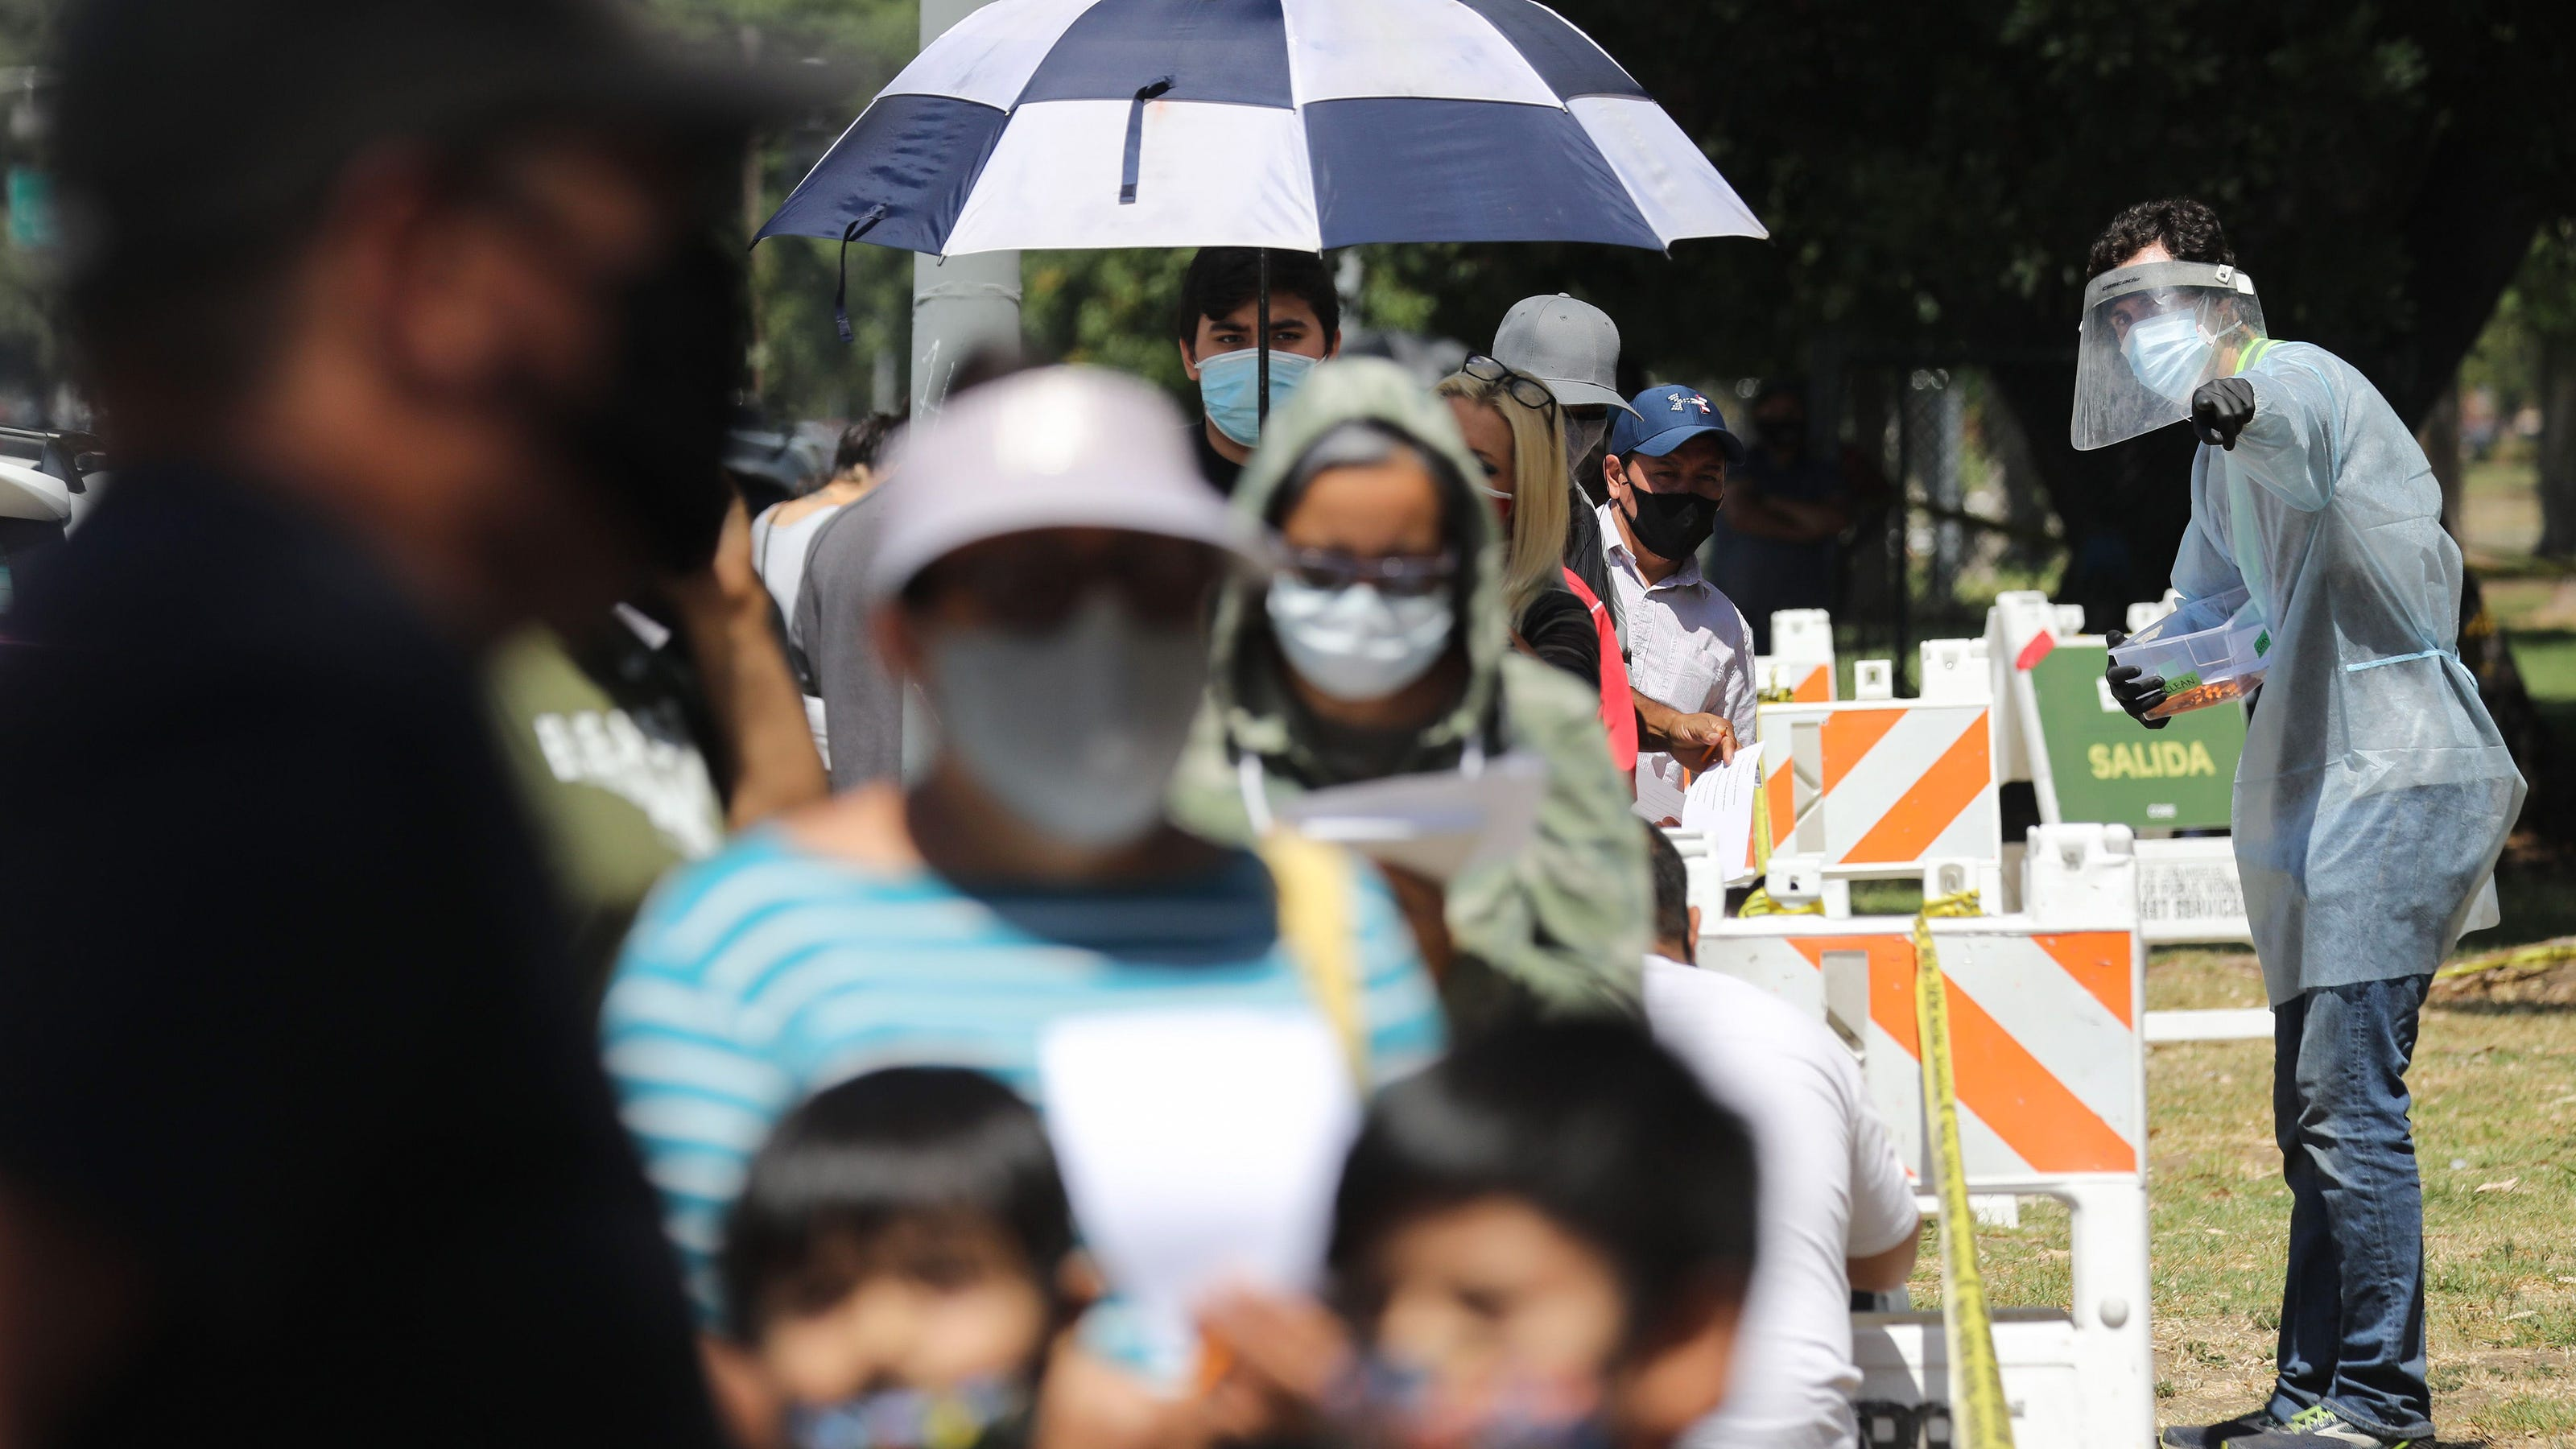 Coronavirus updates: Cuomo takes heat over nursing home deaths; California tightens restrictions; New York sends testing teams to Atlanta – USA TODAY